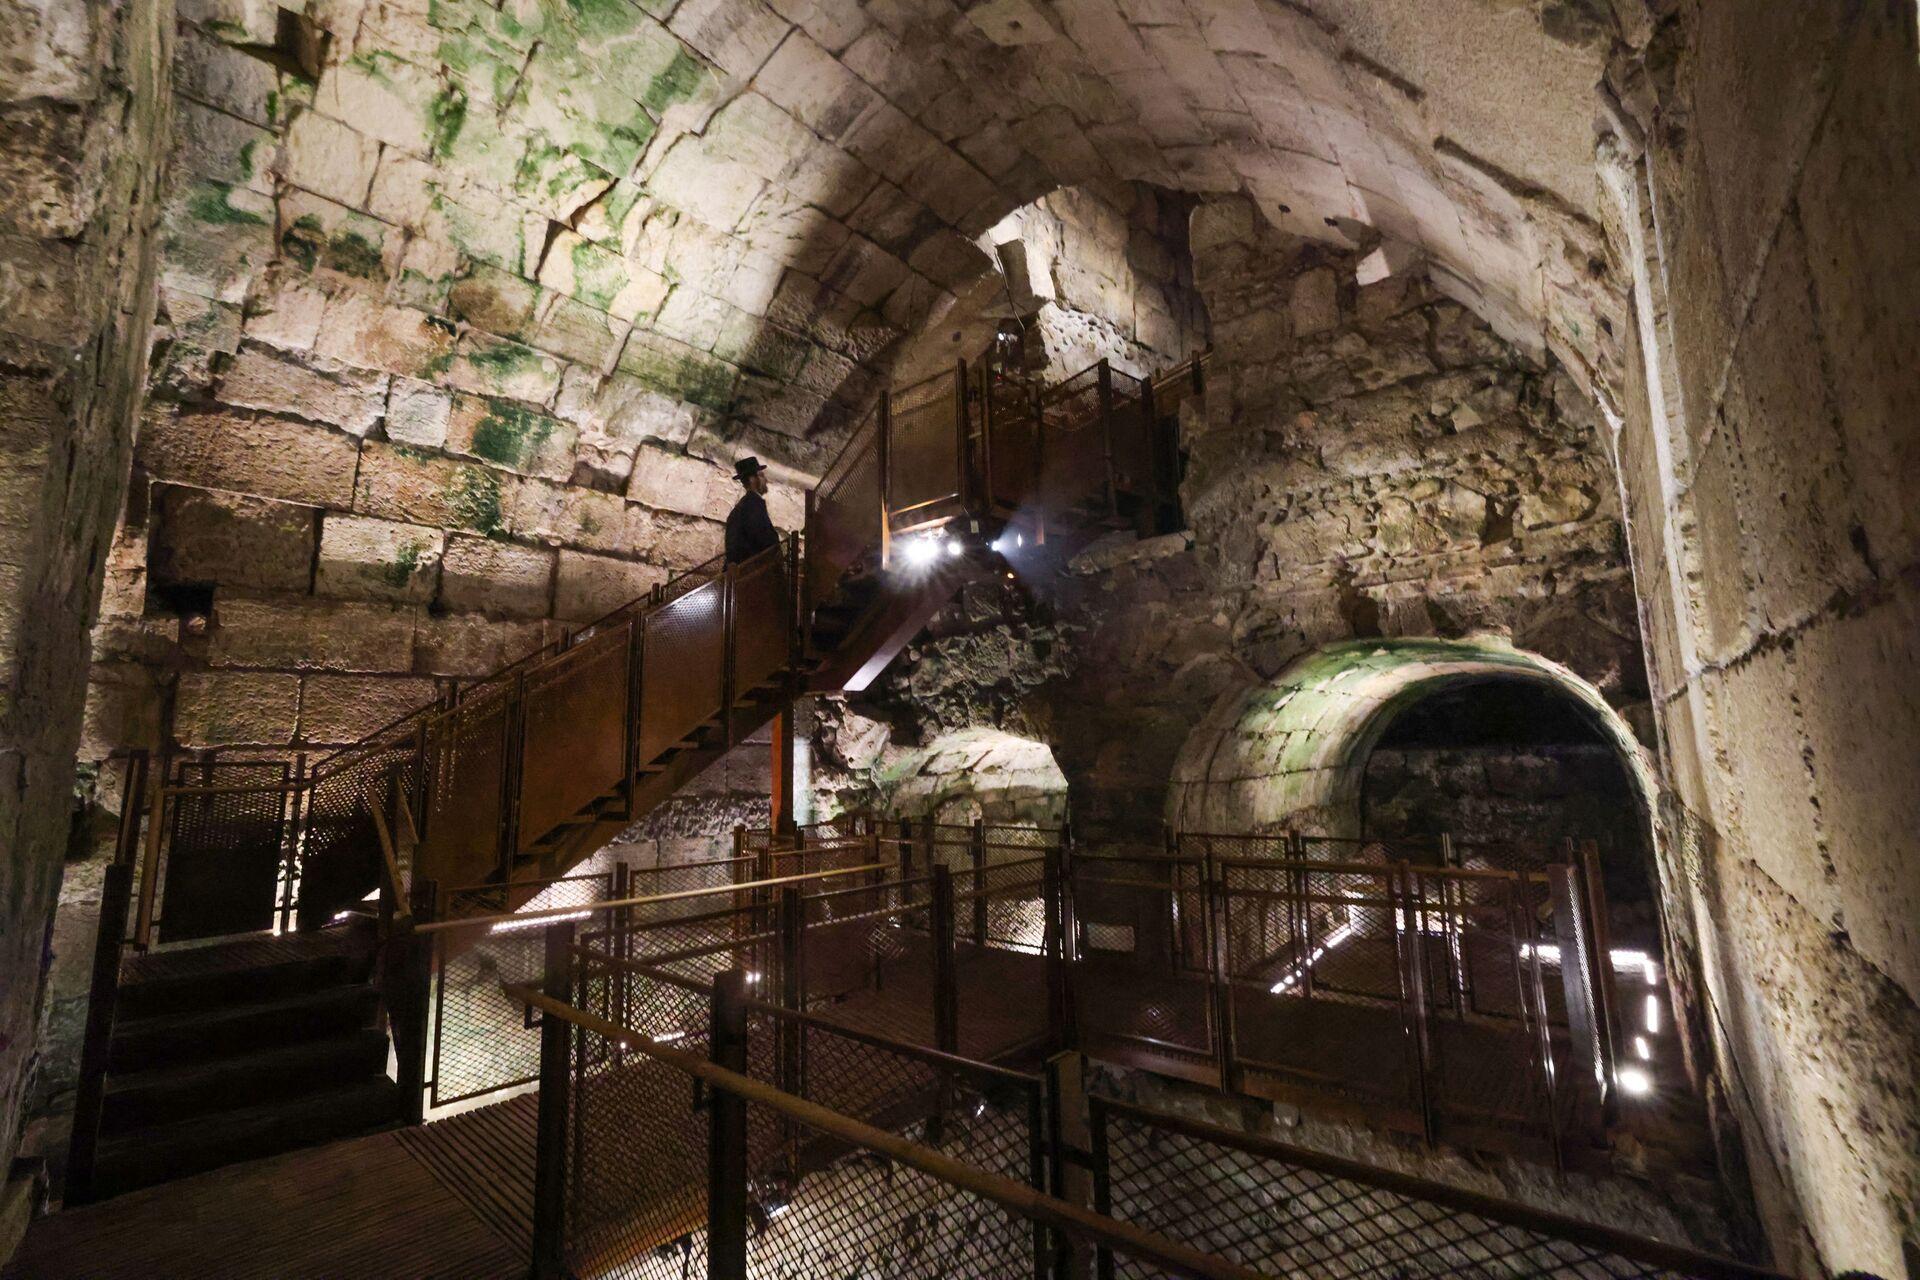 Jevrejin posmatra delove javne zgrade iz perioda Drugog hrama (516. p.n.e. – 70. n.e.) koja se smatra jednom od najluksuznijih do danas nađenih - Sputnik Srbija, 1920, 13.07.2021